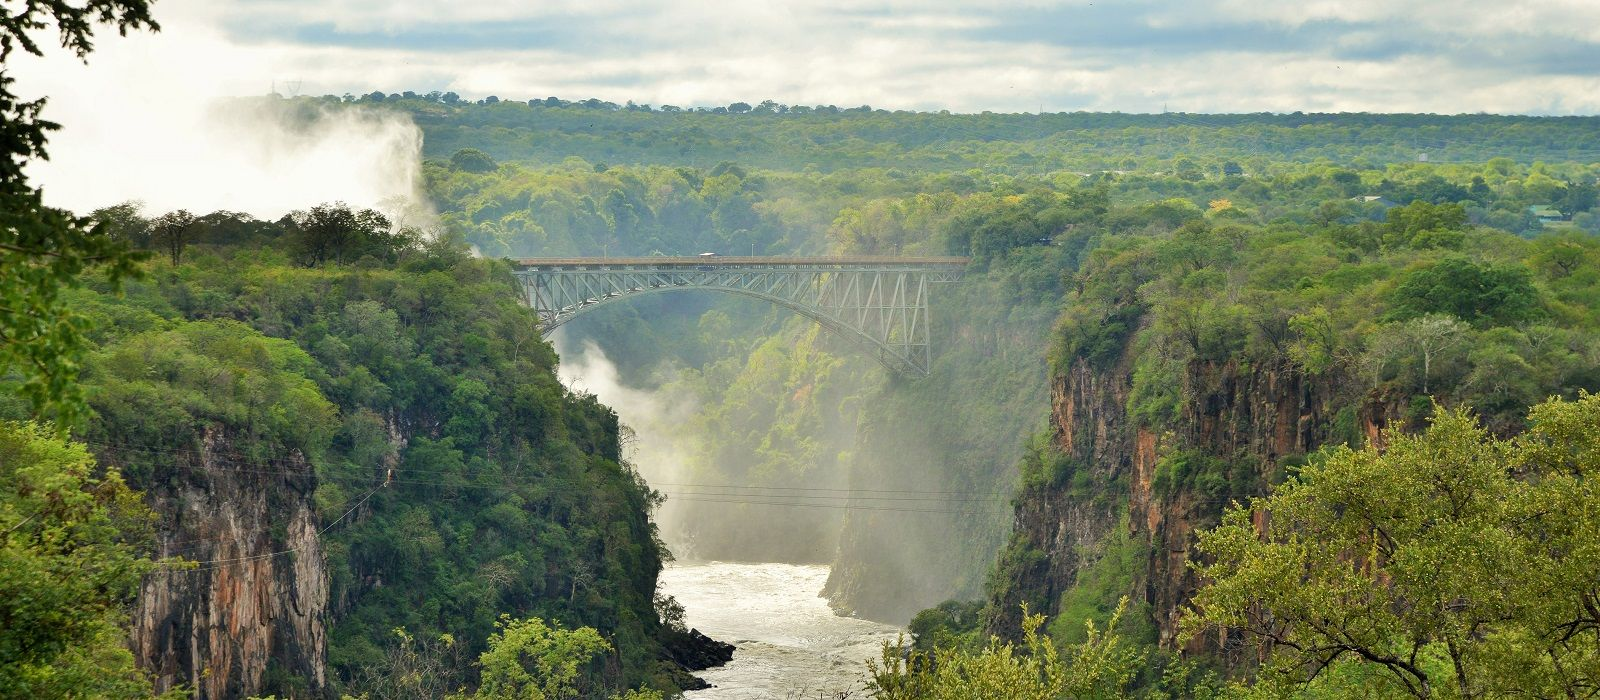 South Africa, Zimbabwe and Botswana: Wildlife and Waterfalls Tour Trip 2